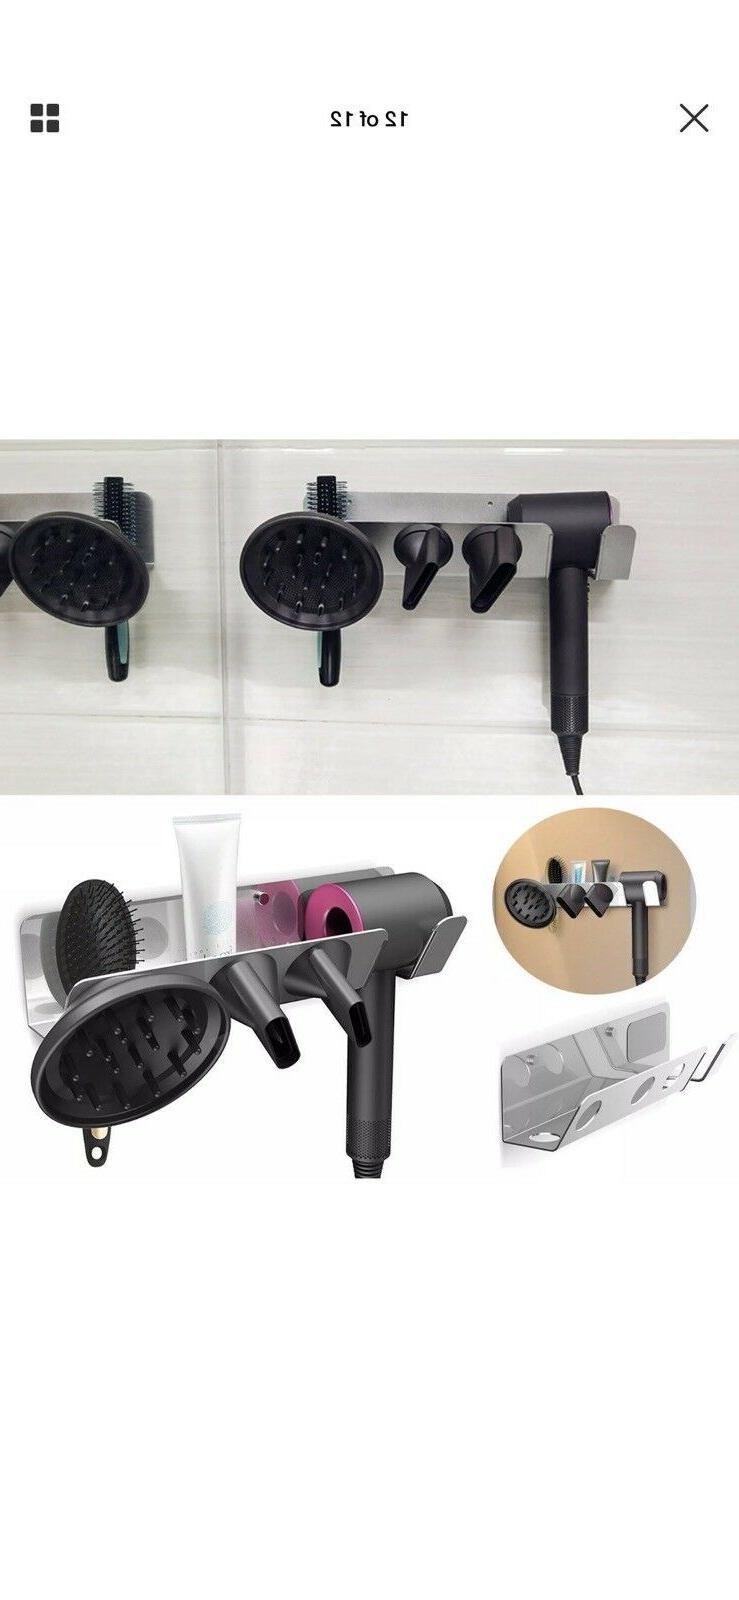 Dyson Mount Iron Hair Dryer